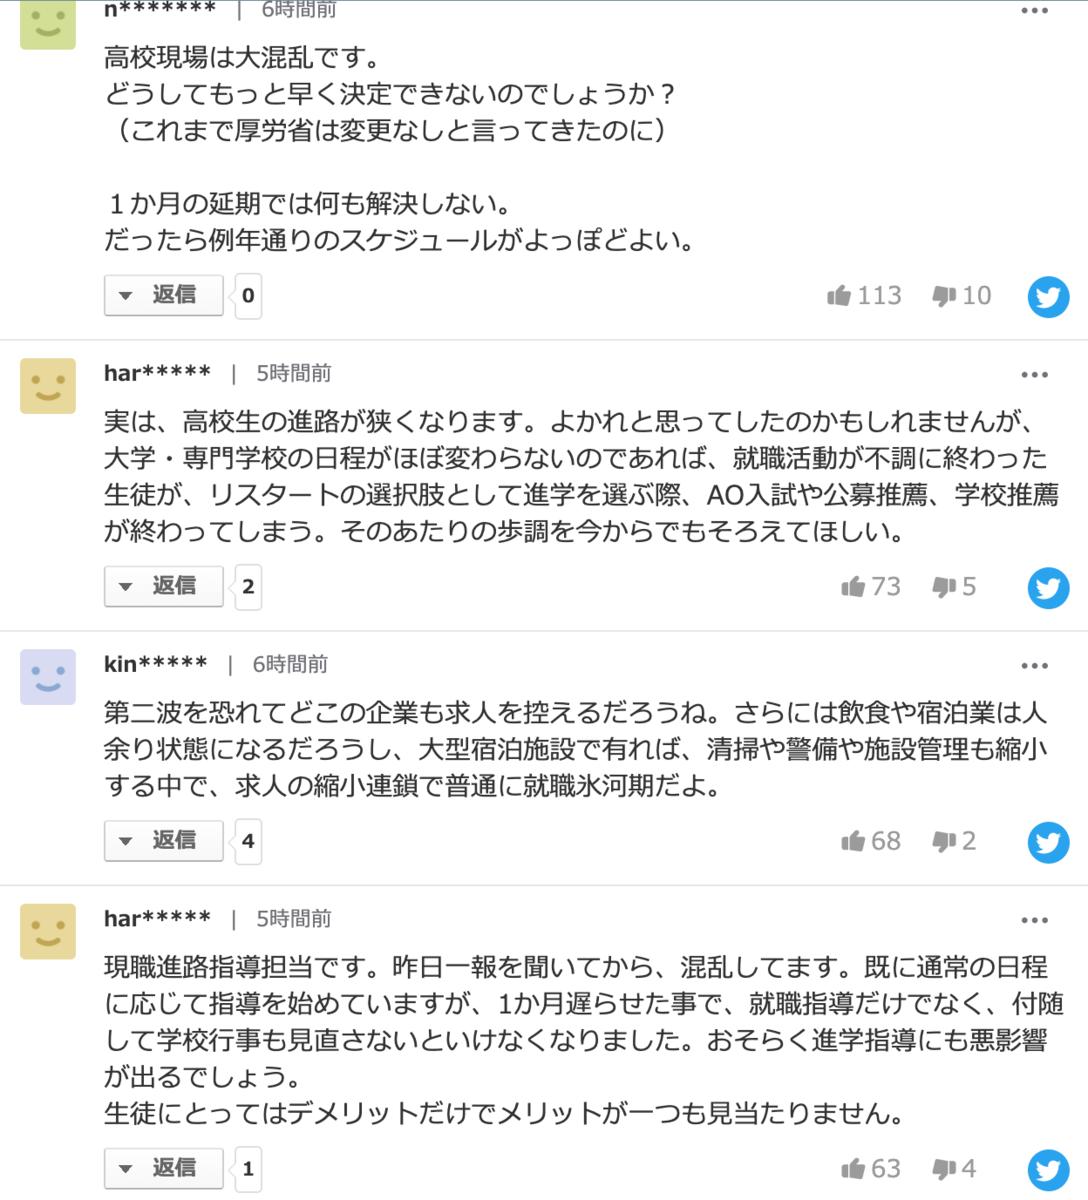 f:id:haruki19940608:20200611233422p:plain